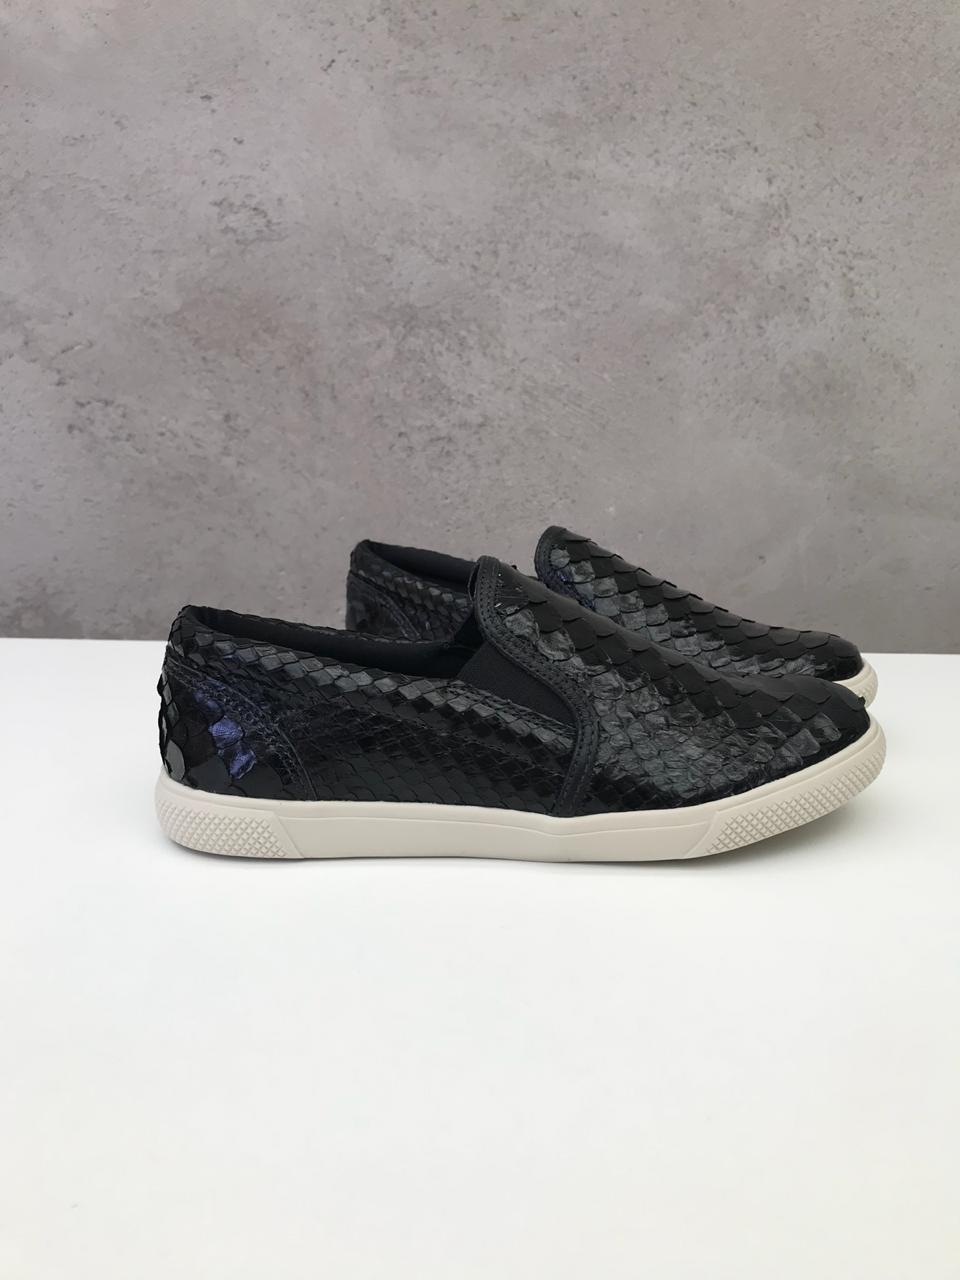 Sneaker Python Preto   - Angelina Vai às Compras